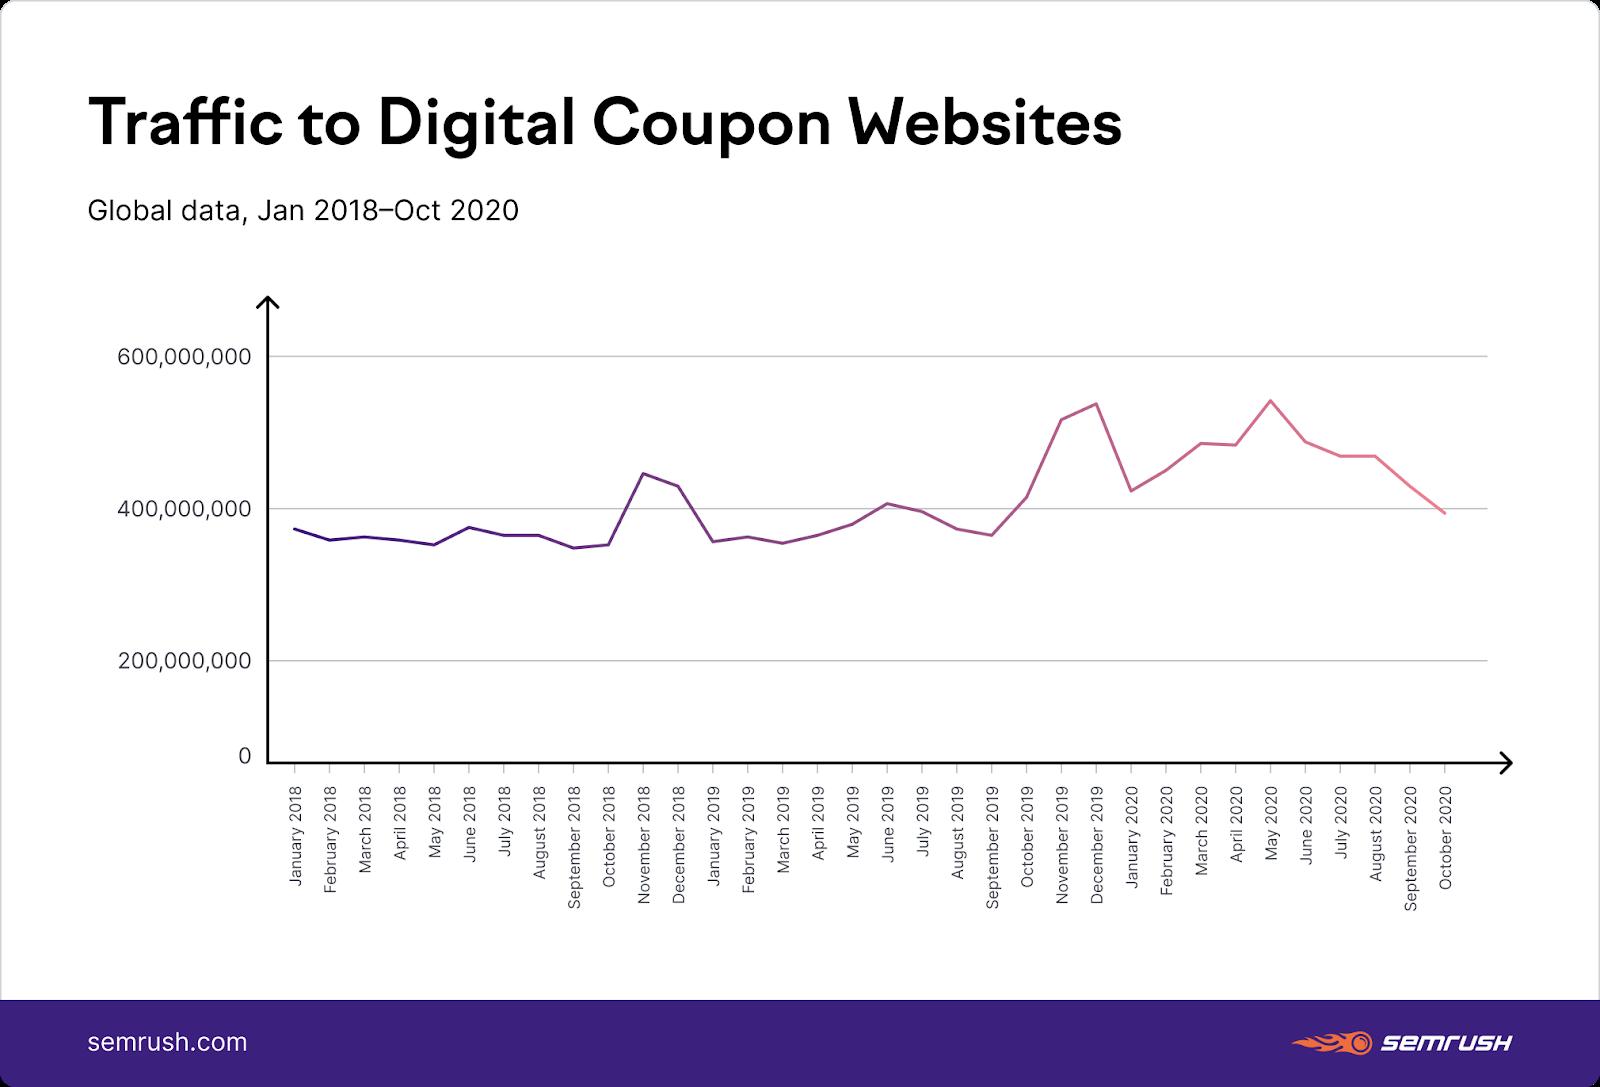 Traffic to digital coupon websites